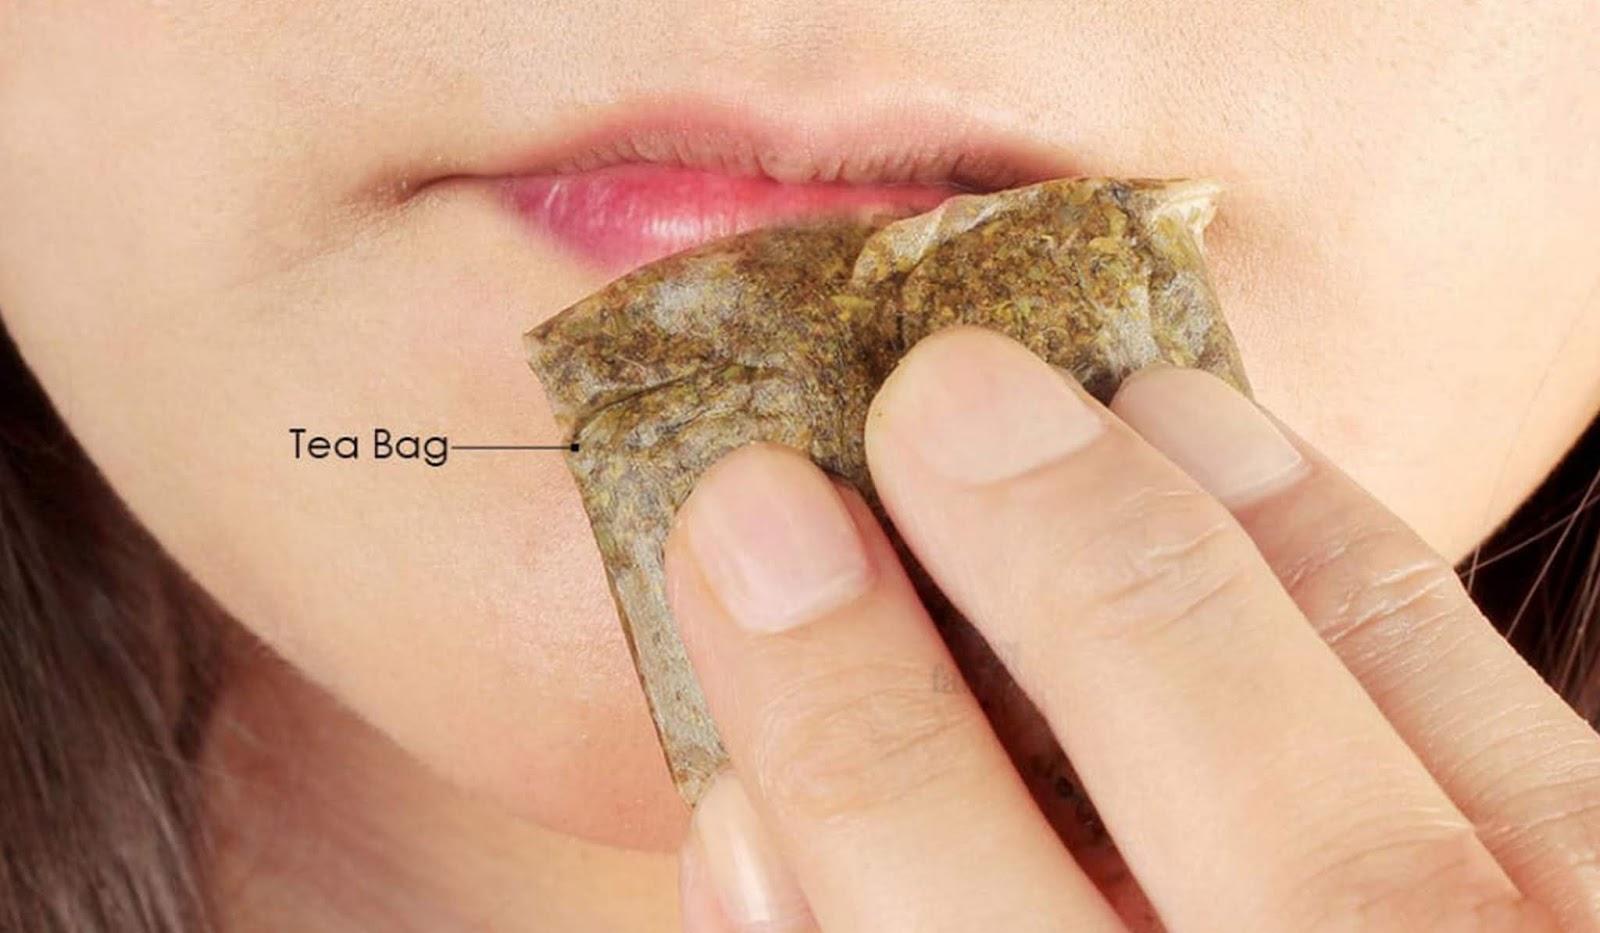 TERBUKTI] Inilah Cara Mengatasi Alergi Lipstik Pada Bibir ...